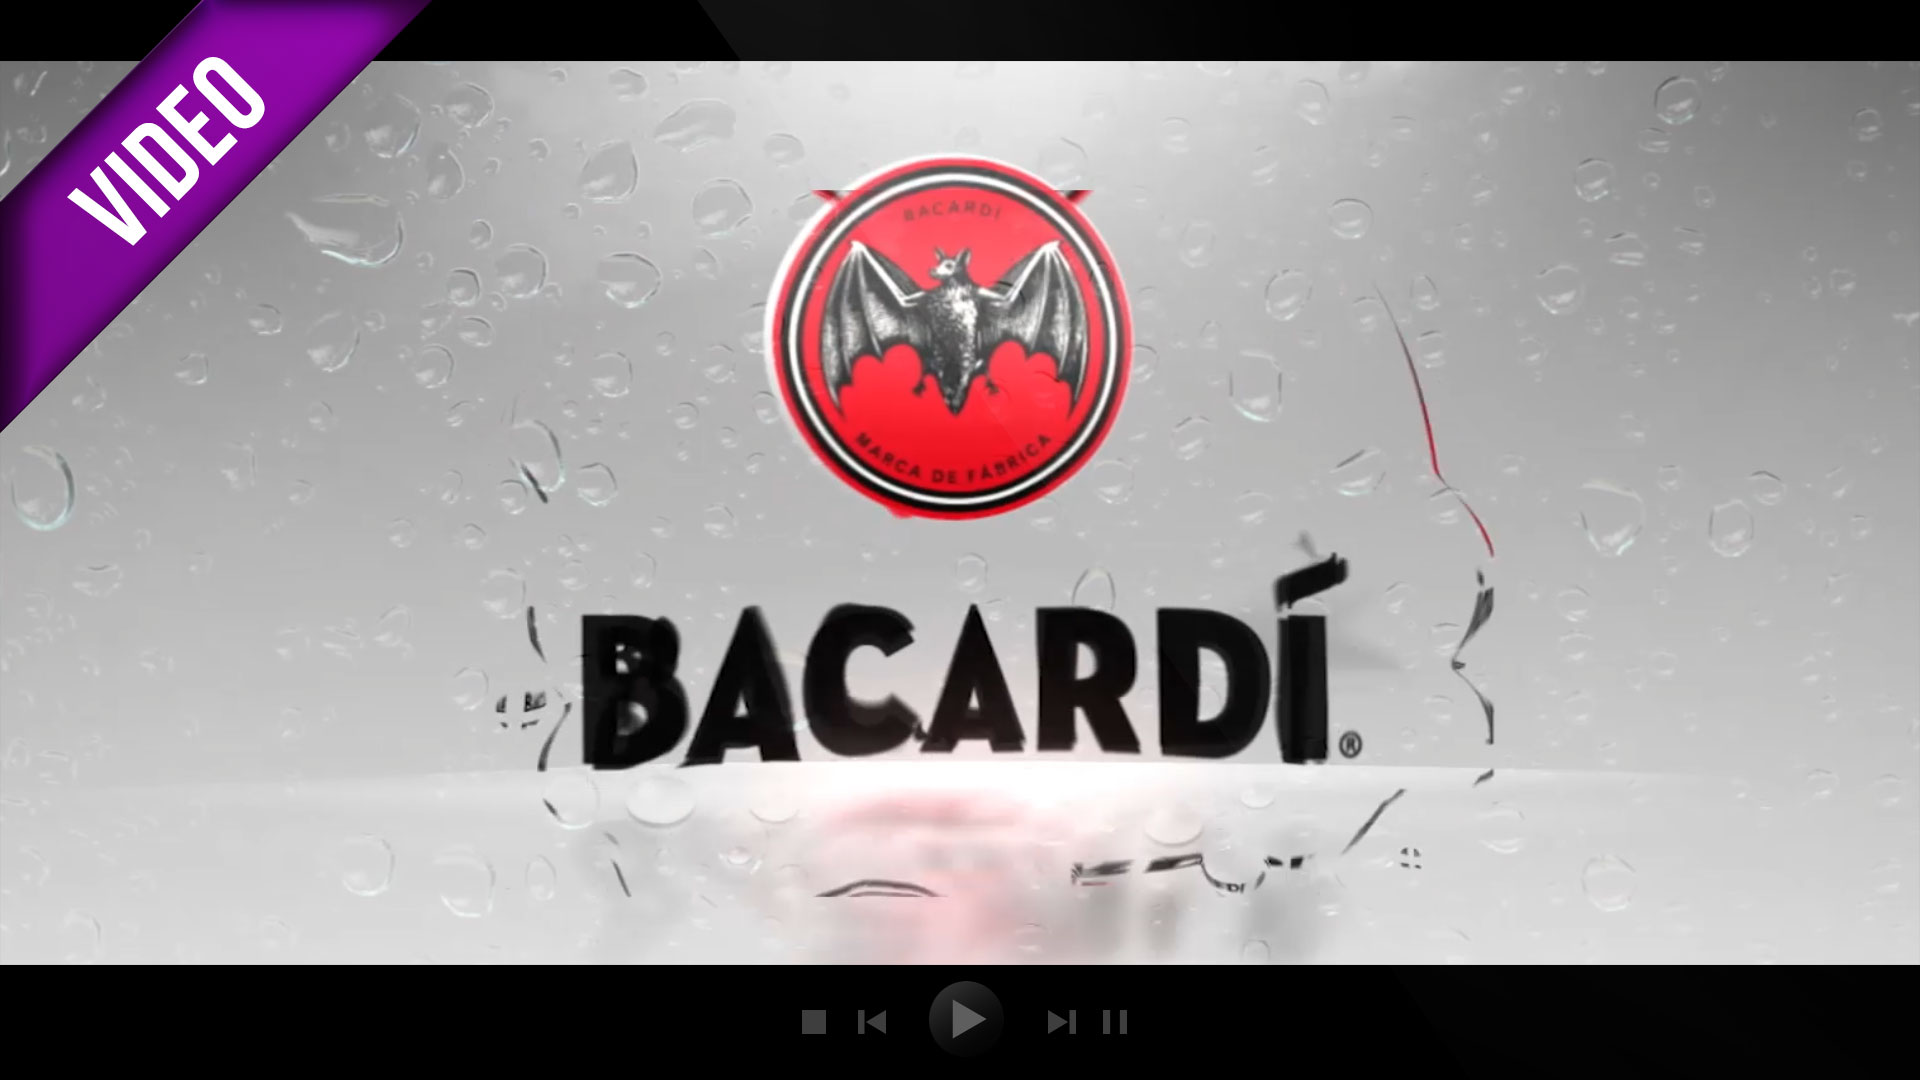 Logo-Sting-Bacardi